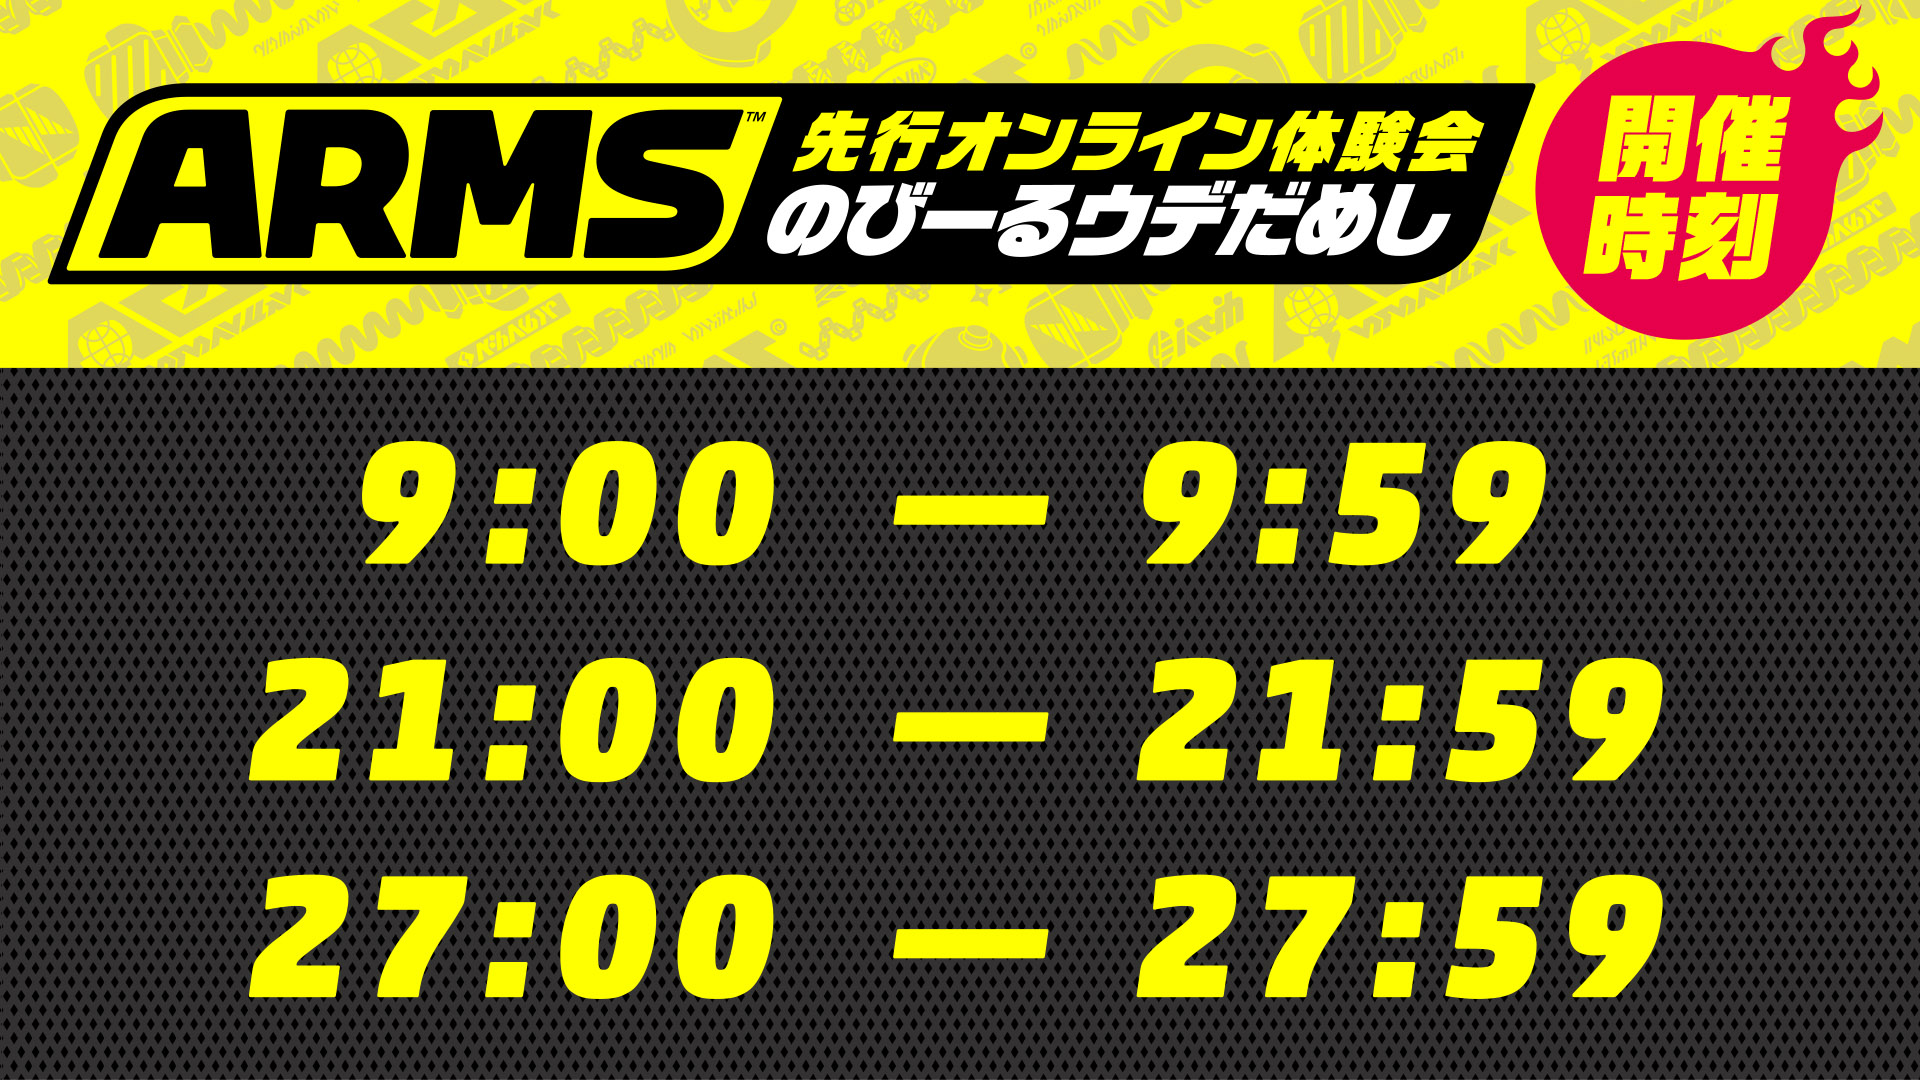 「ARMS Direct 2017.5.18」が放送! 新キャラクターなどが公開